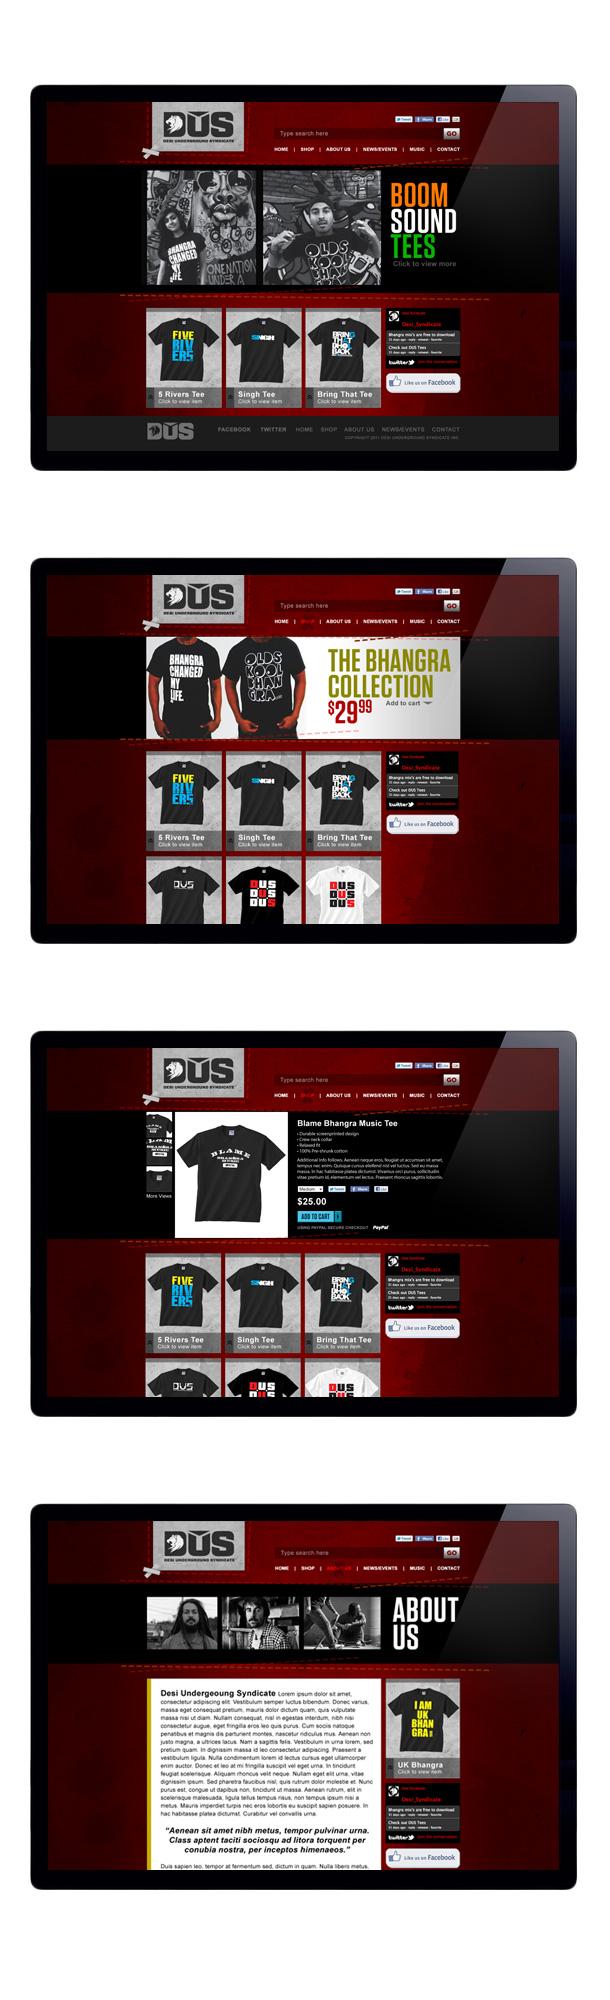 Ondisplay.ca portfolio - DUS web shots